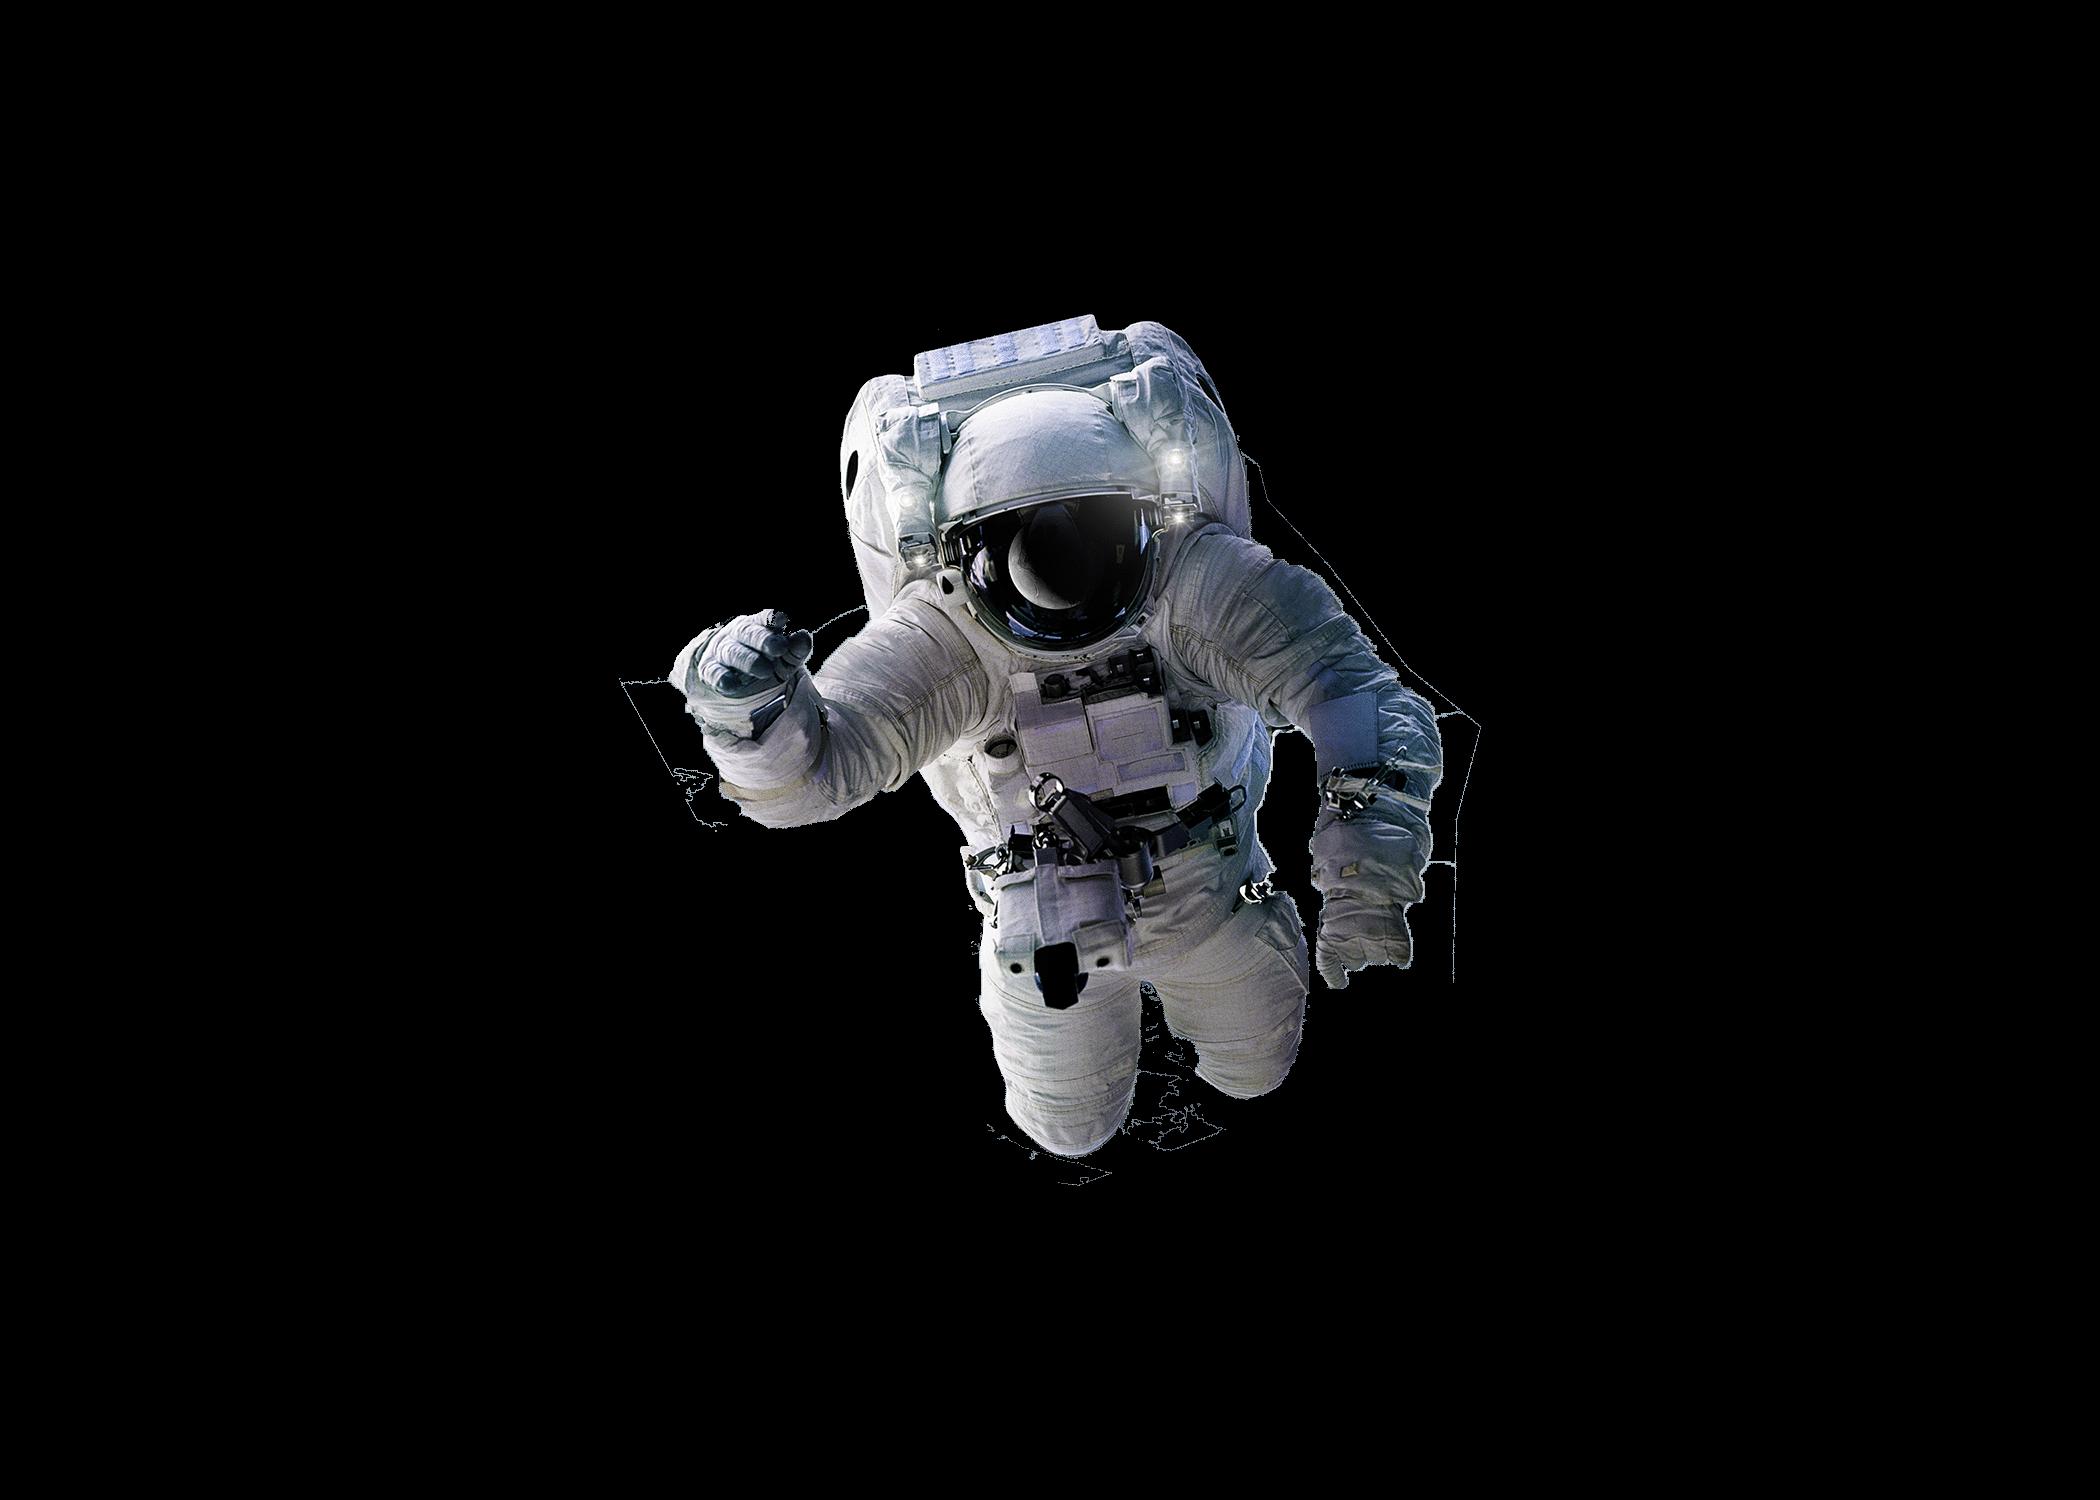 astronautTrans